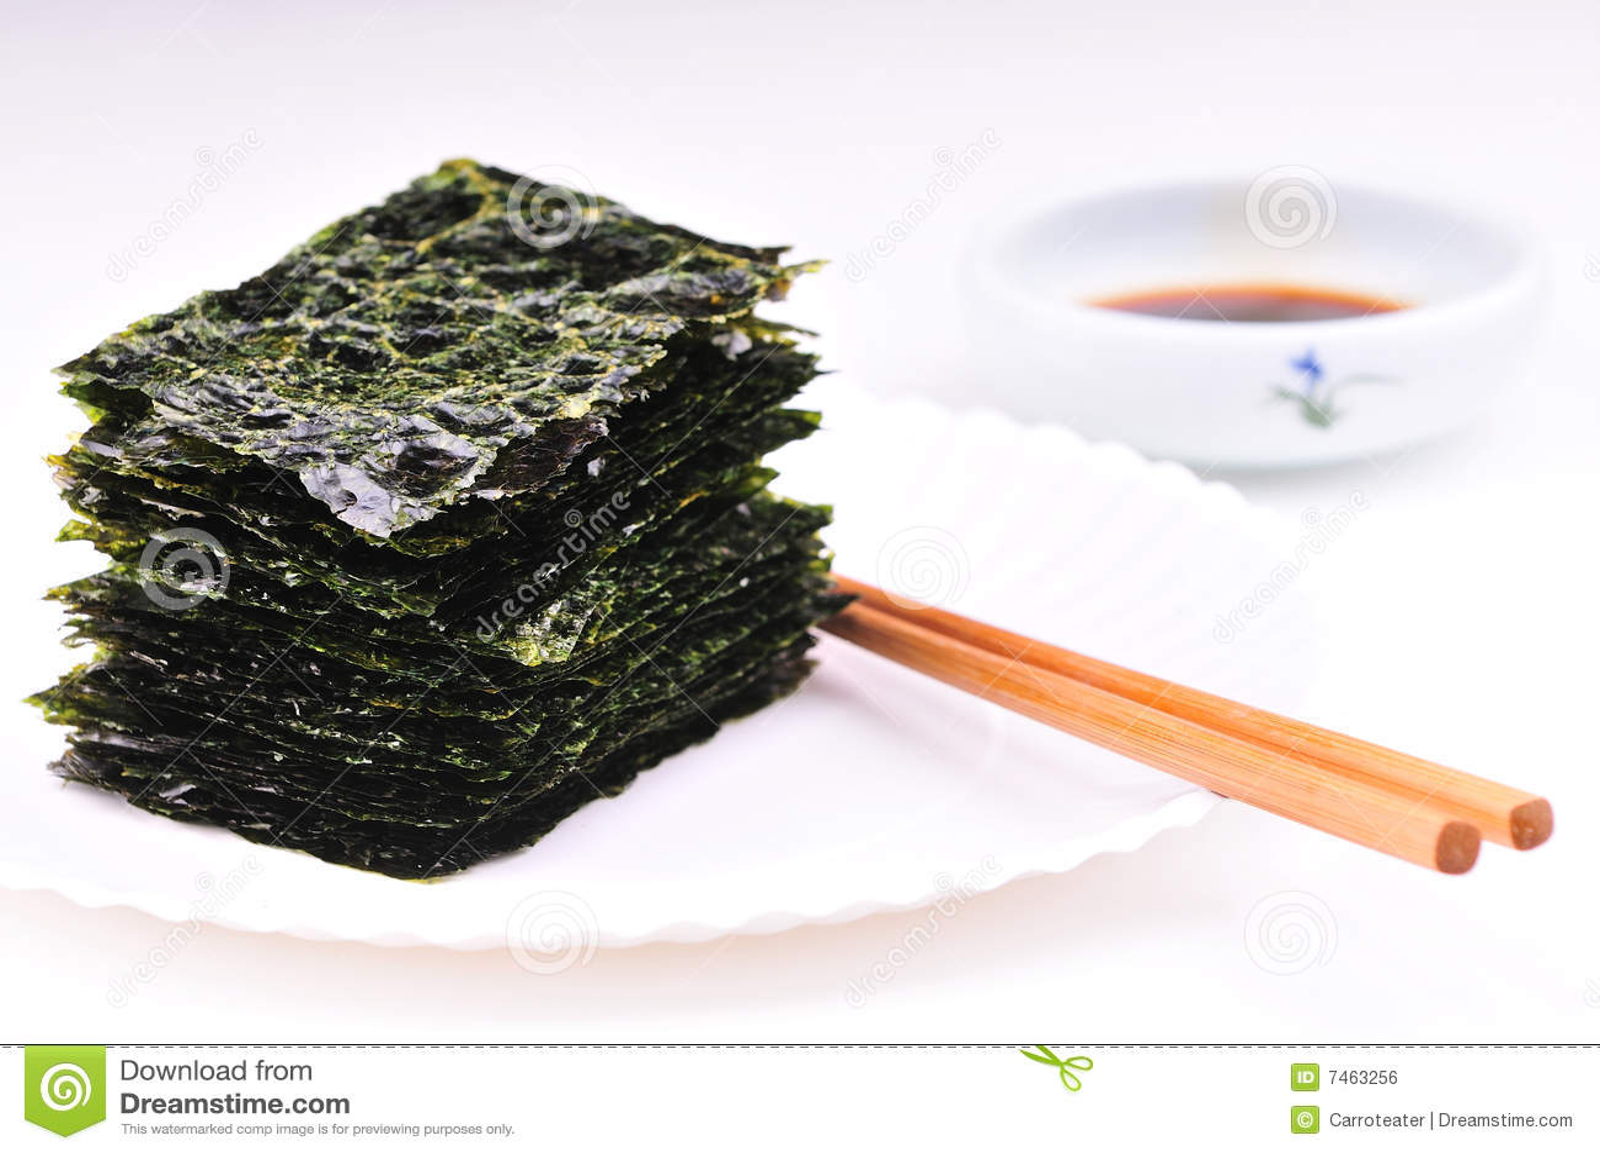 Seaweed business plan